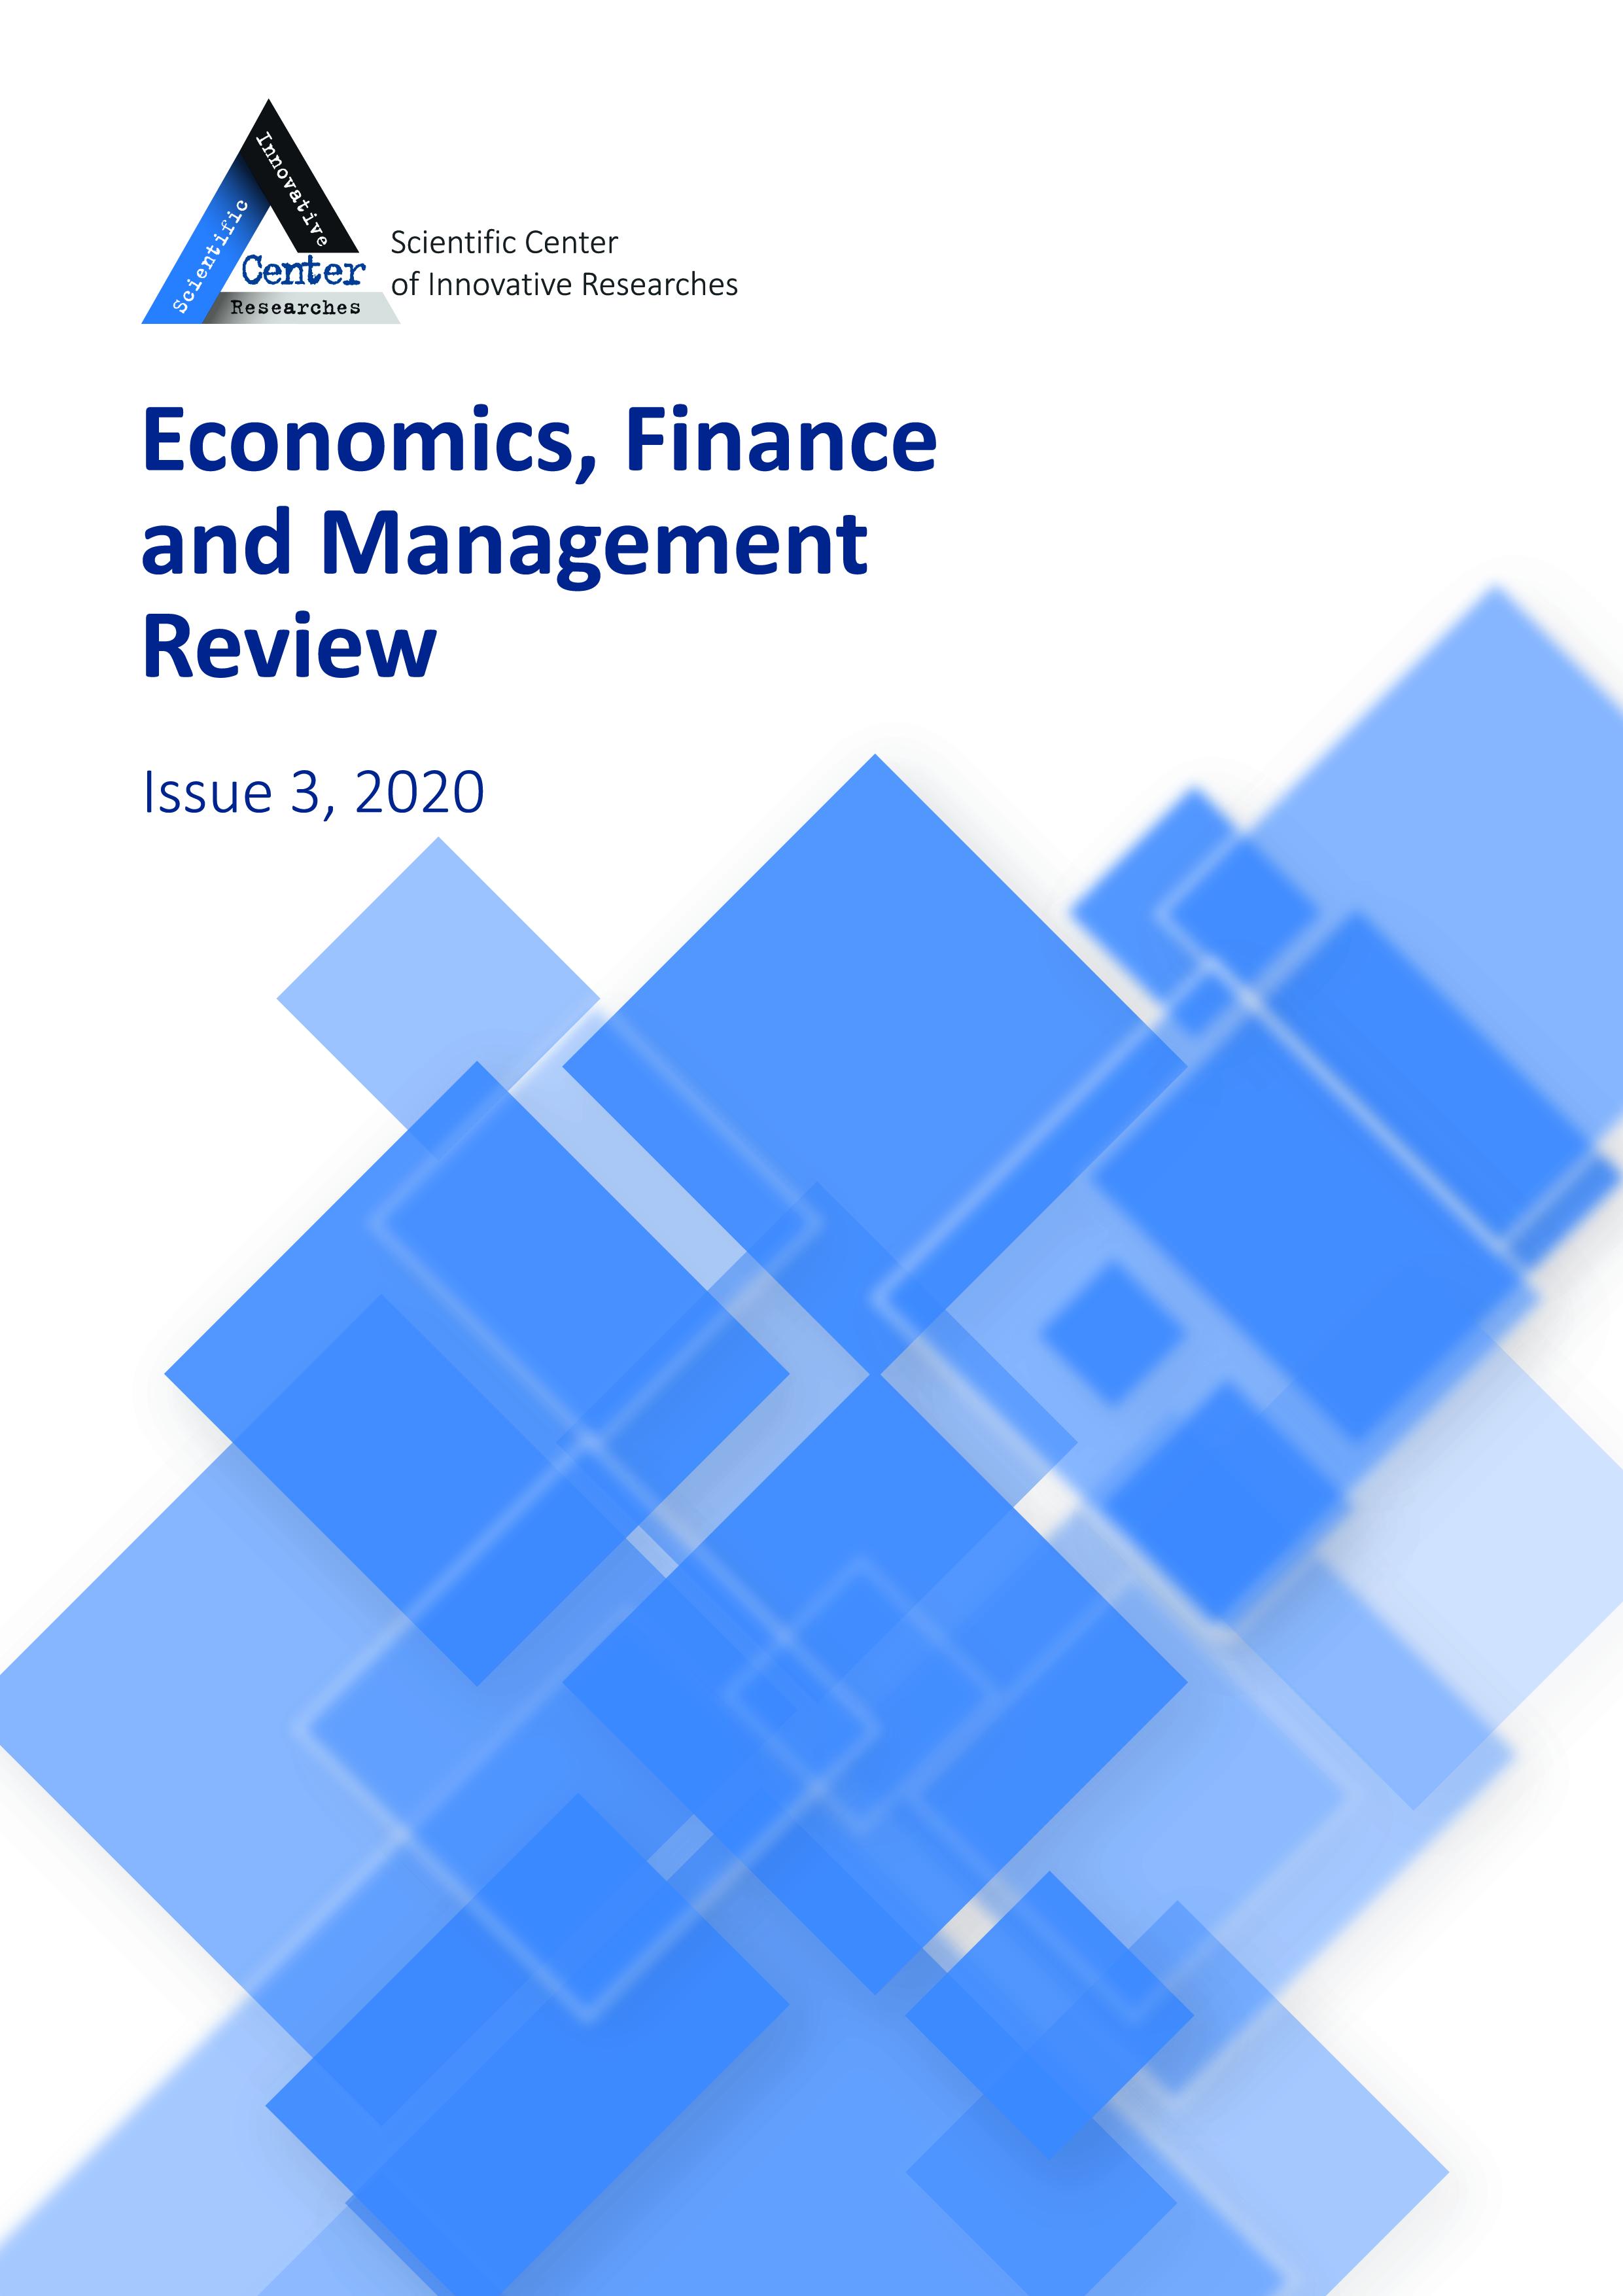 View No. 3 (2020): Economics, Finance And Management Review